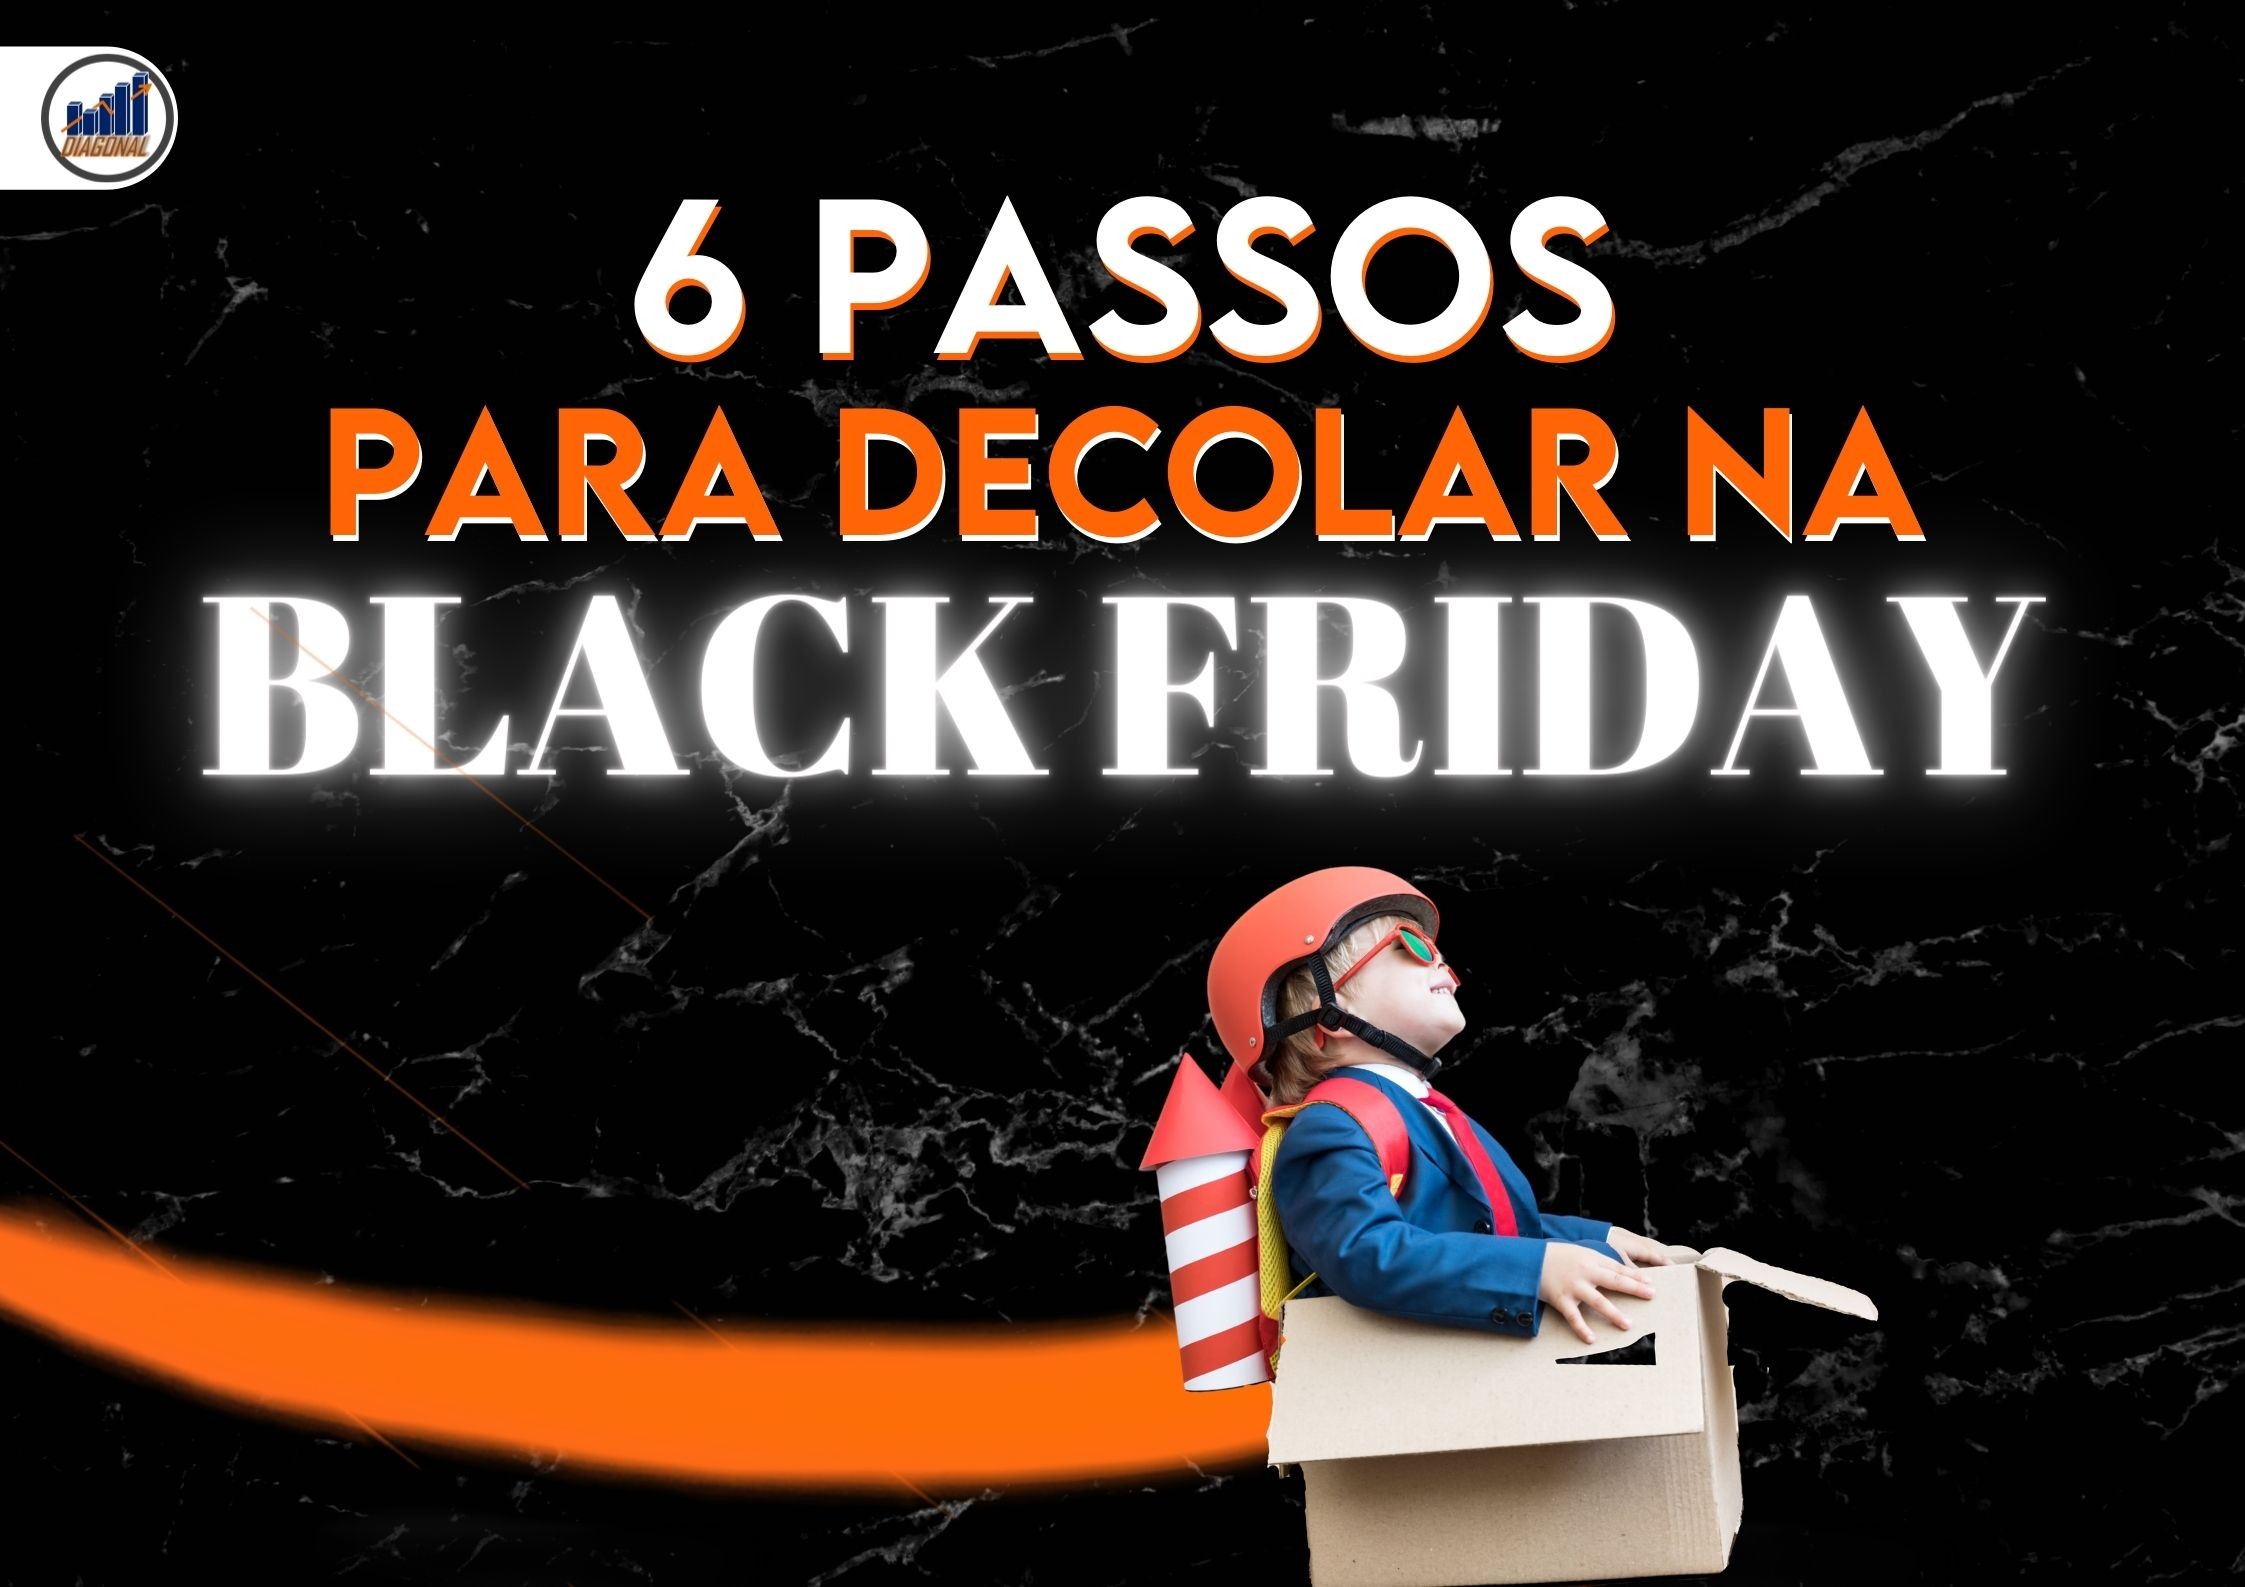 6 Passos para Decolar na Black Friday